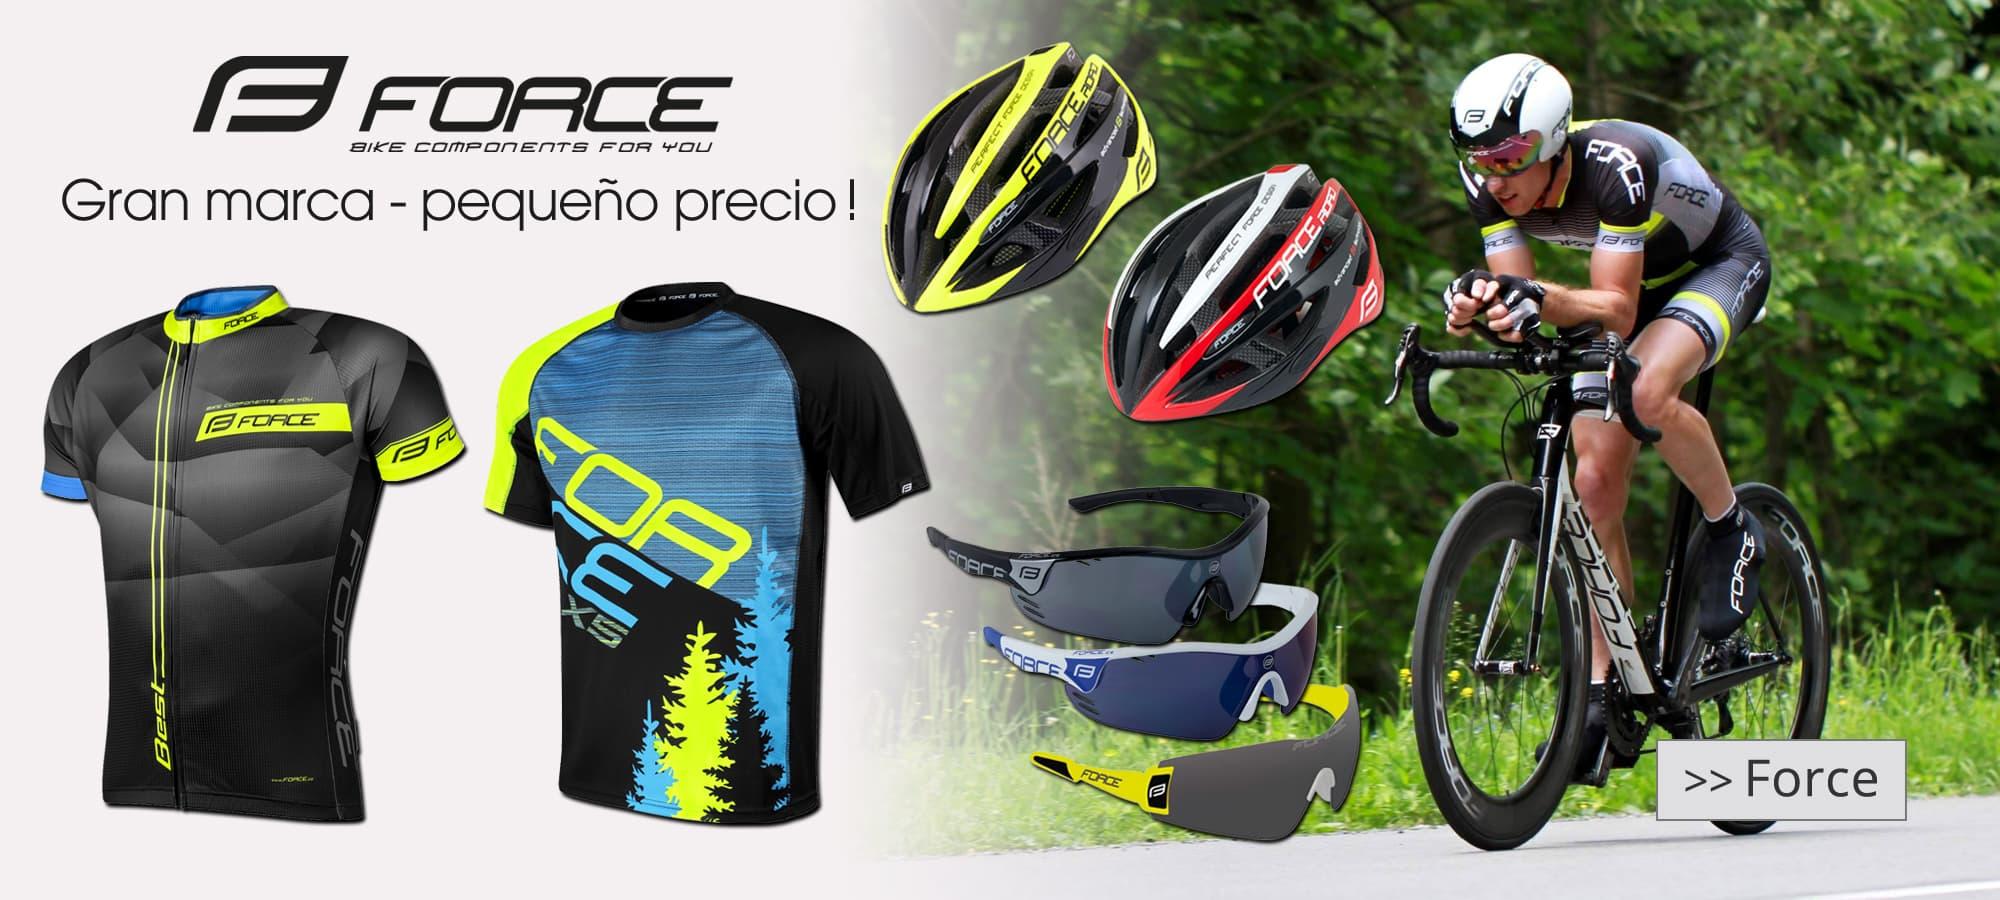 Force ropa ciclista & Accesorios